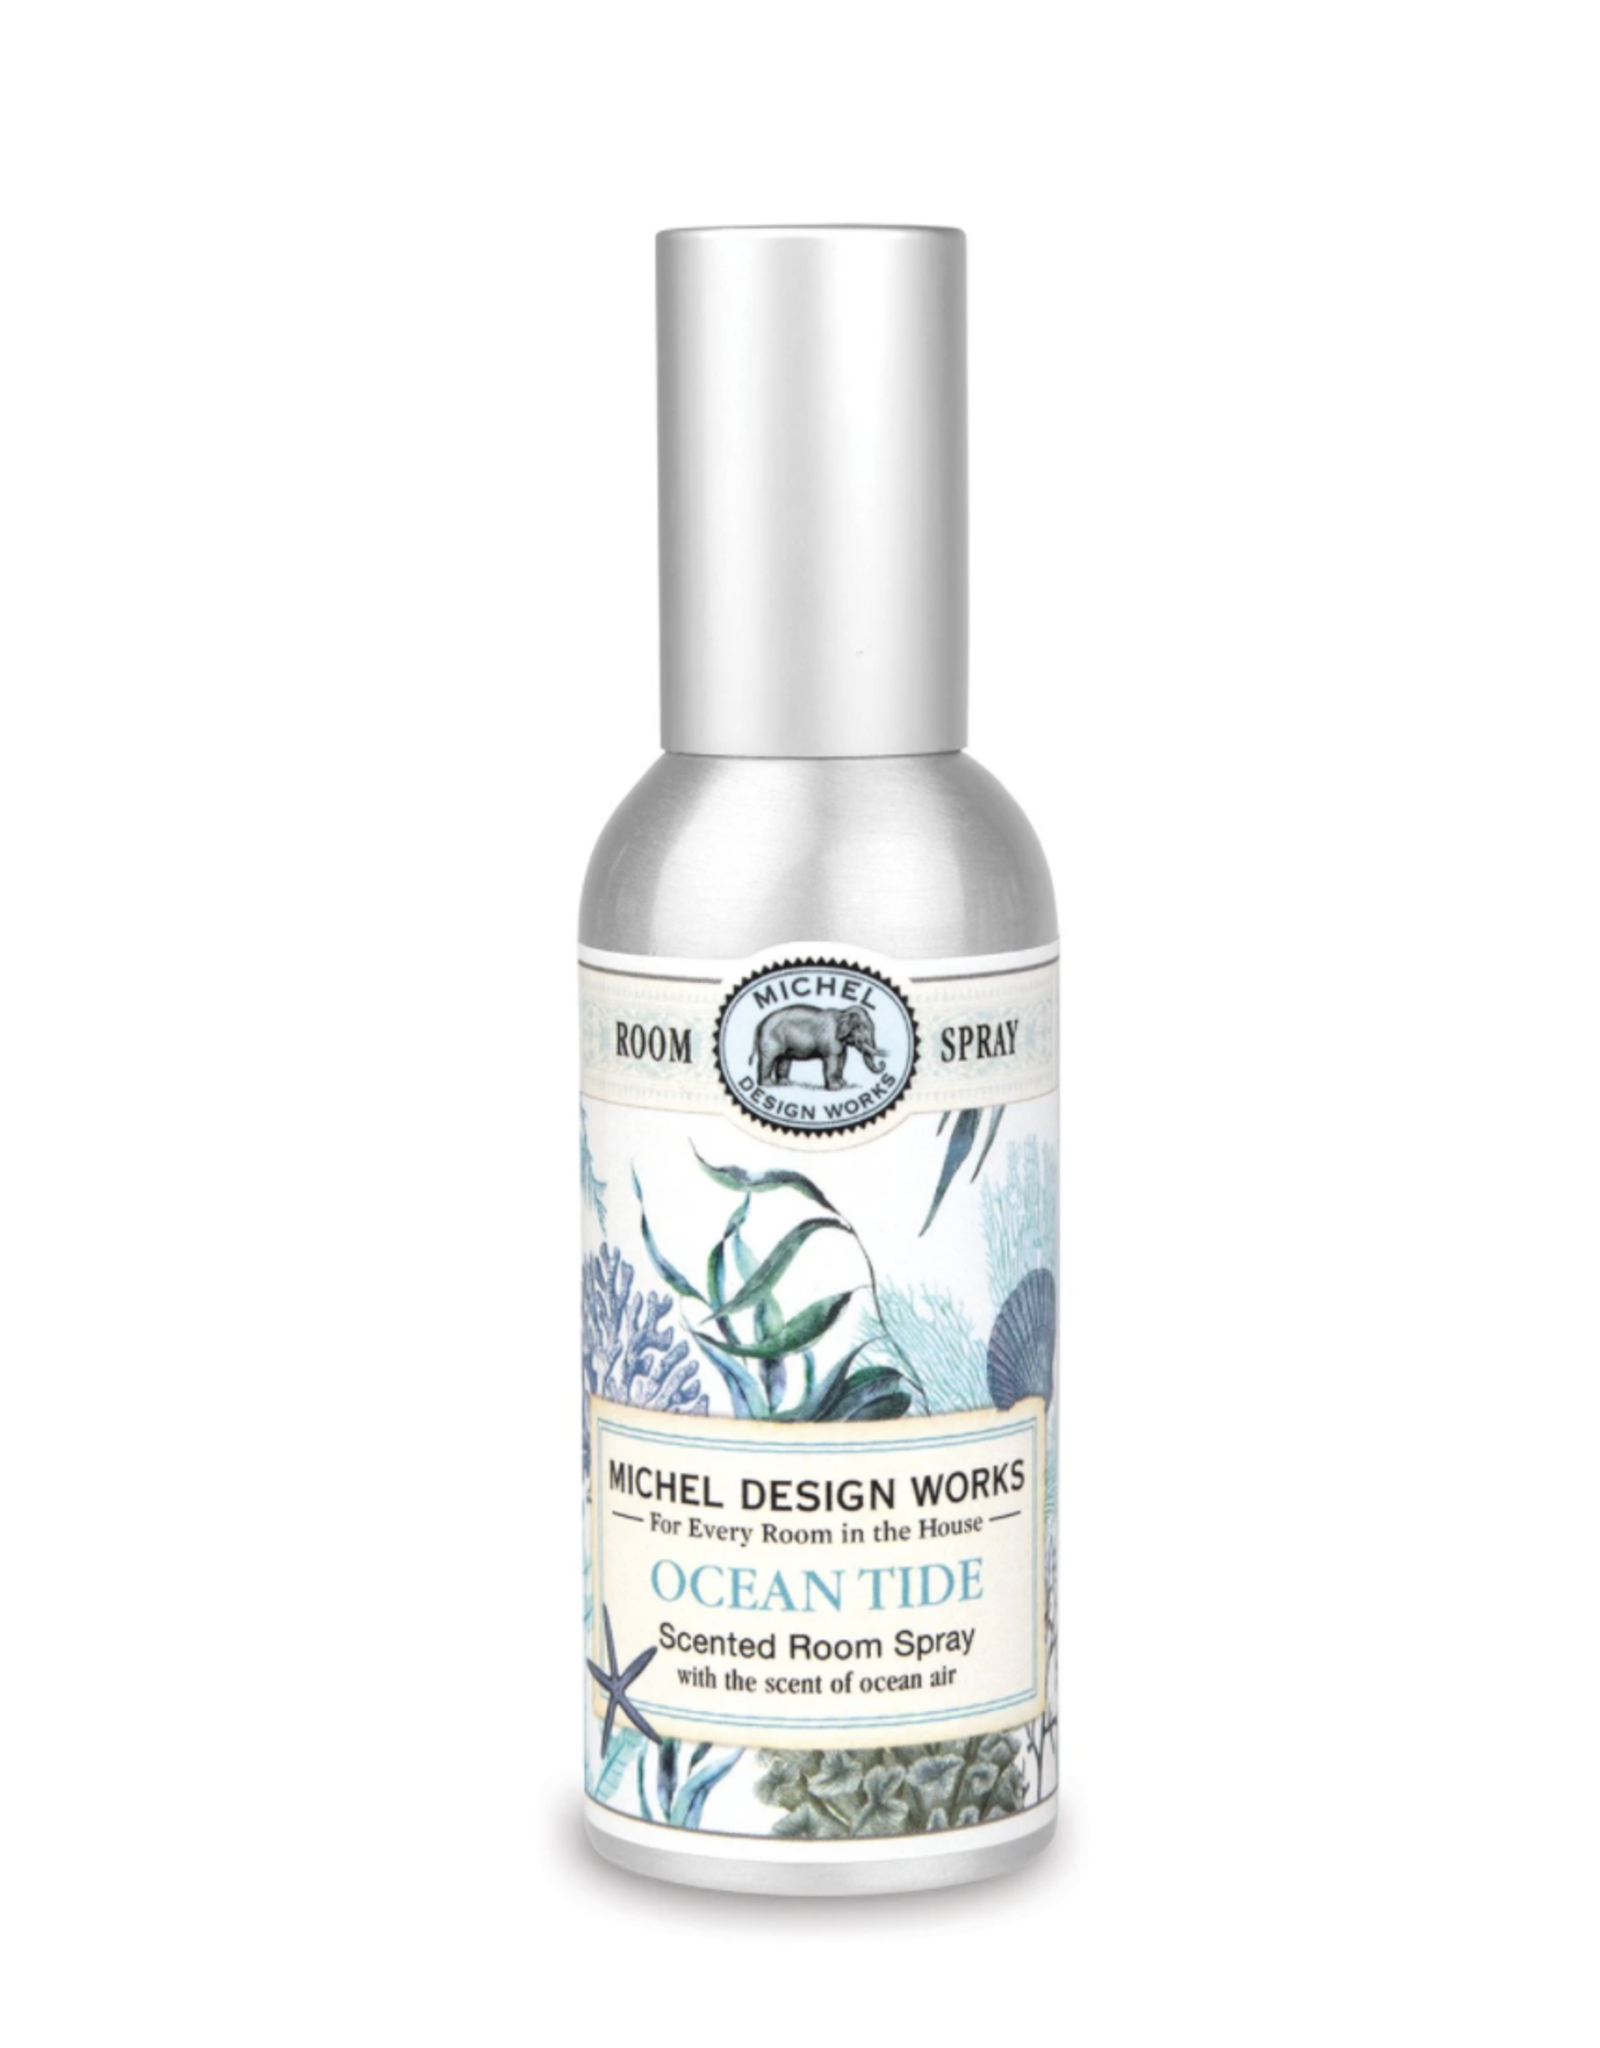 Michel Design Works Ocean Tide Room Spray